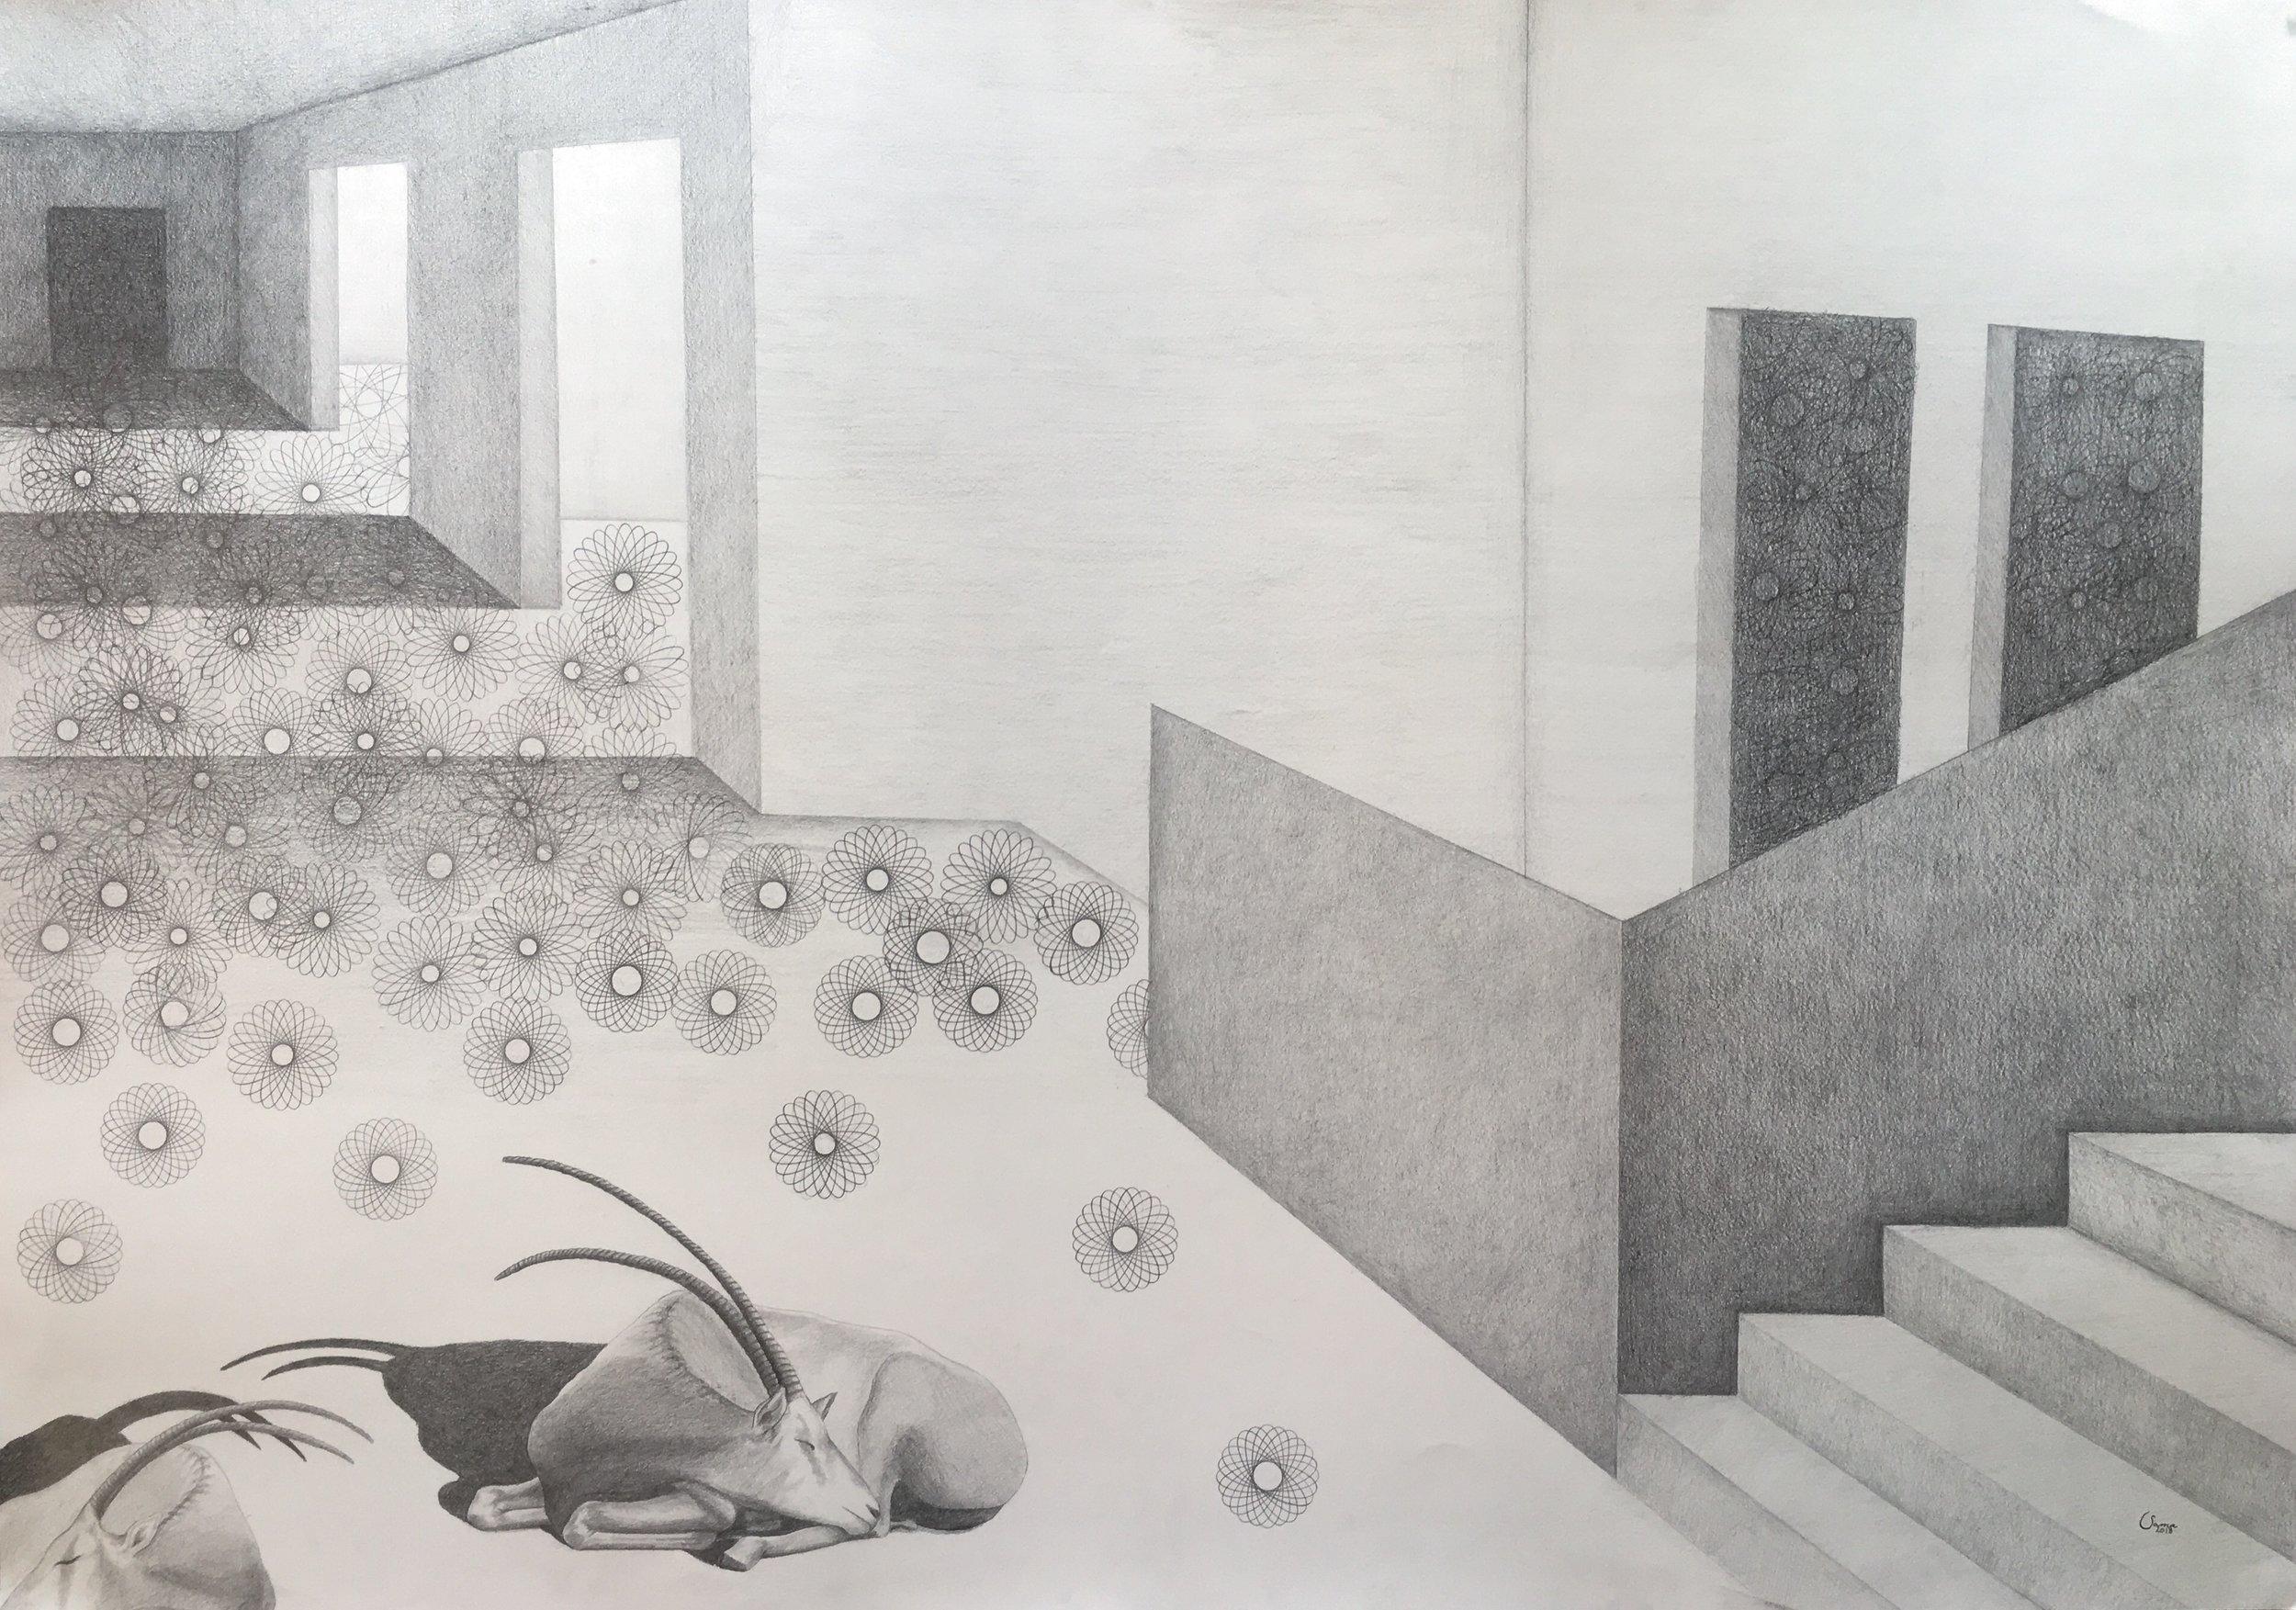 Maia Maha, pencil on paper, 70 x 100 cm, 2018